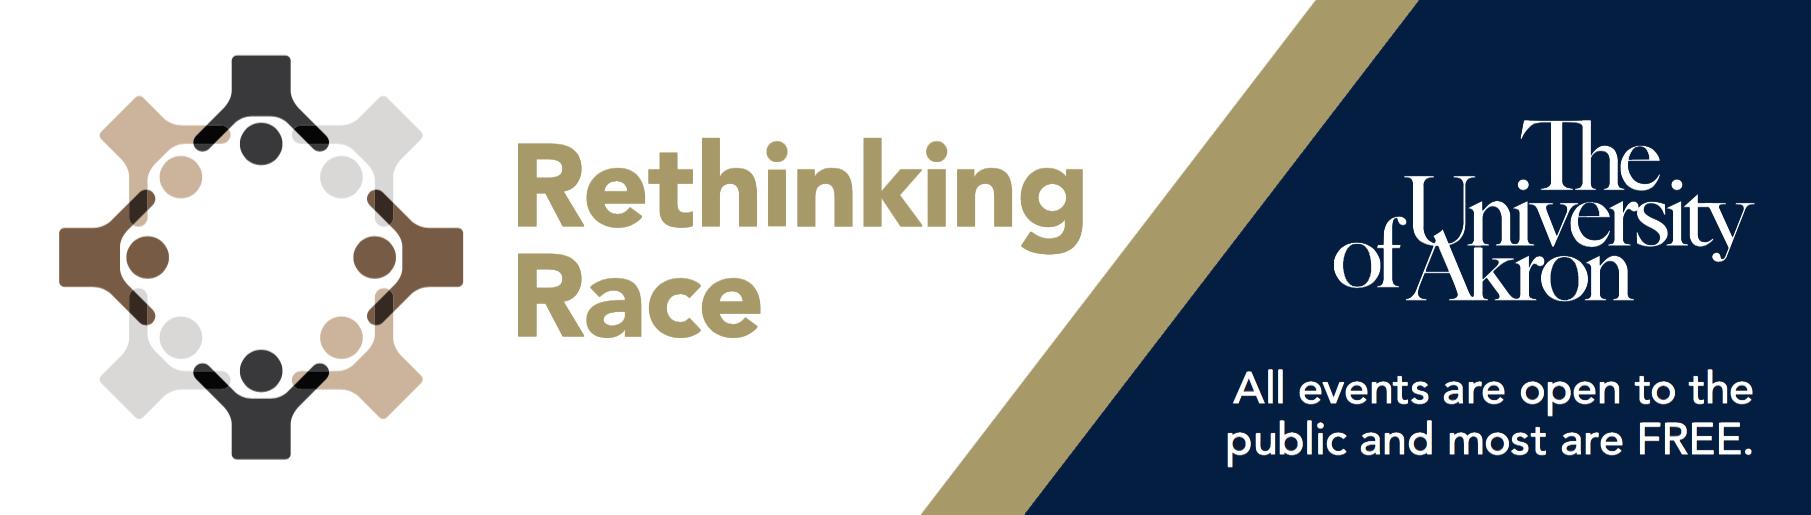 Rethinking Race: Black, White And Beyond : The University Of Regarding Univeristy Of Akron Calendar 2020